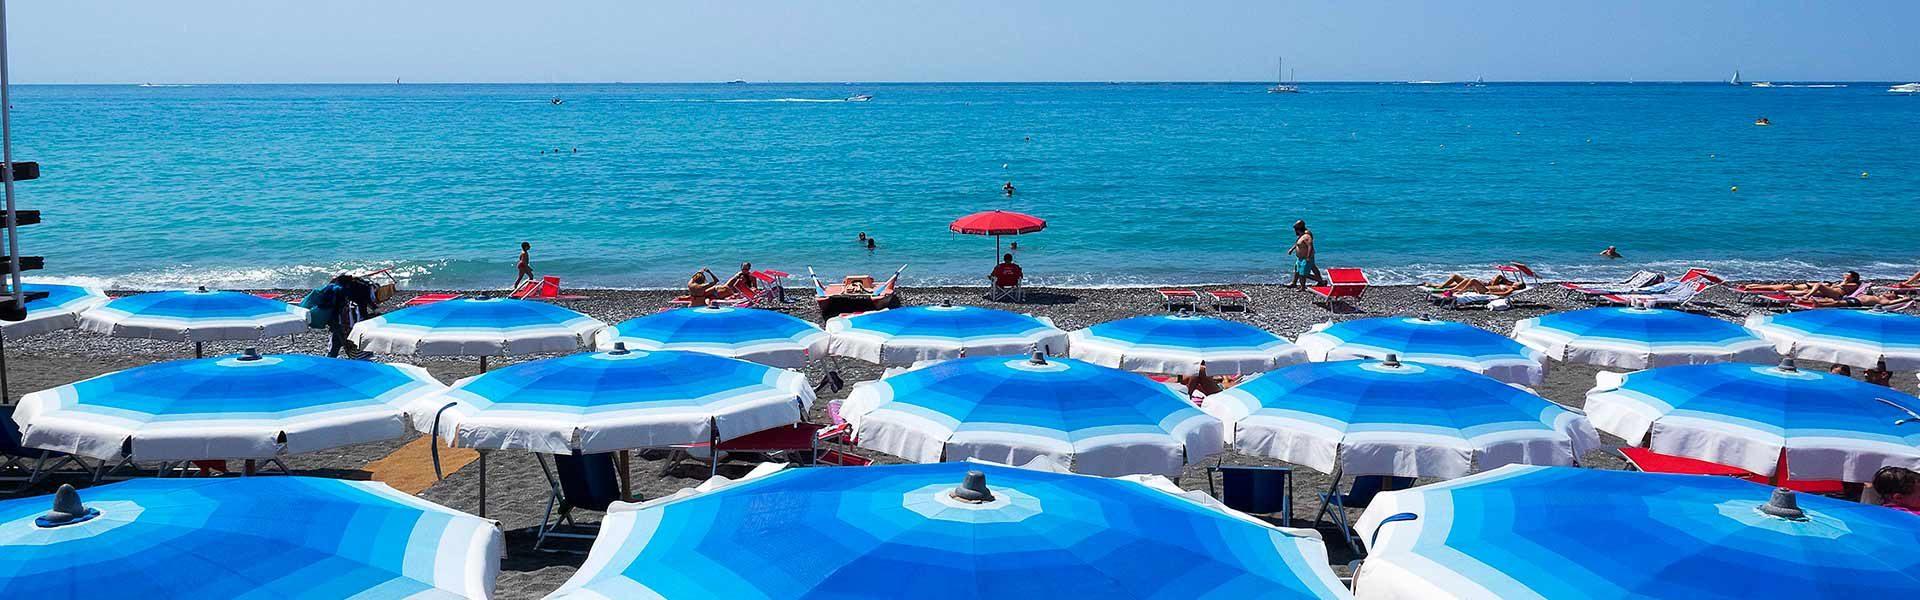 spiaggia_golfotigullio_hoteltirrenocavi_4